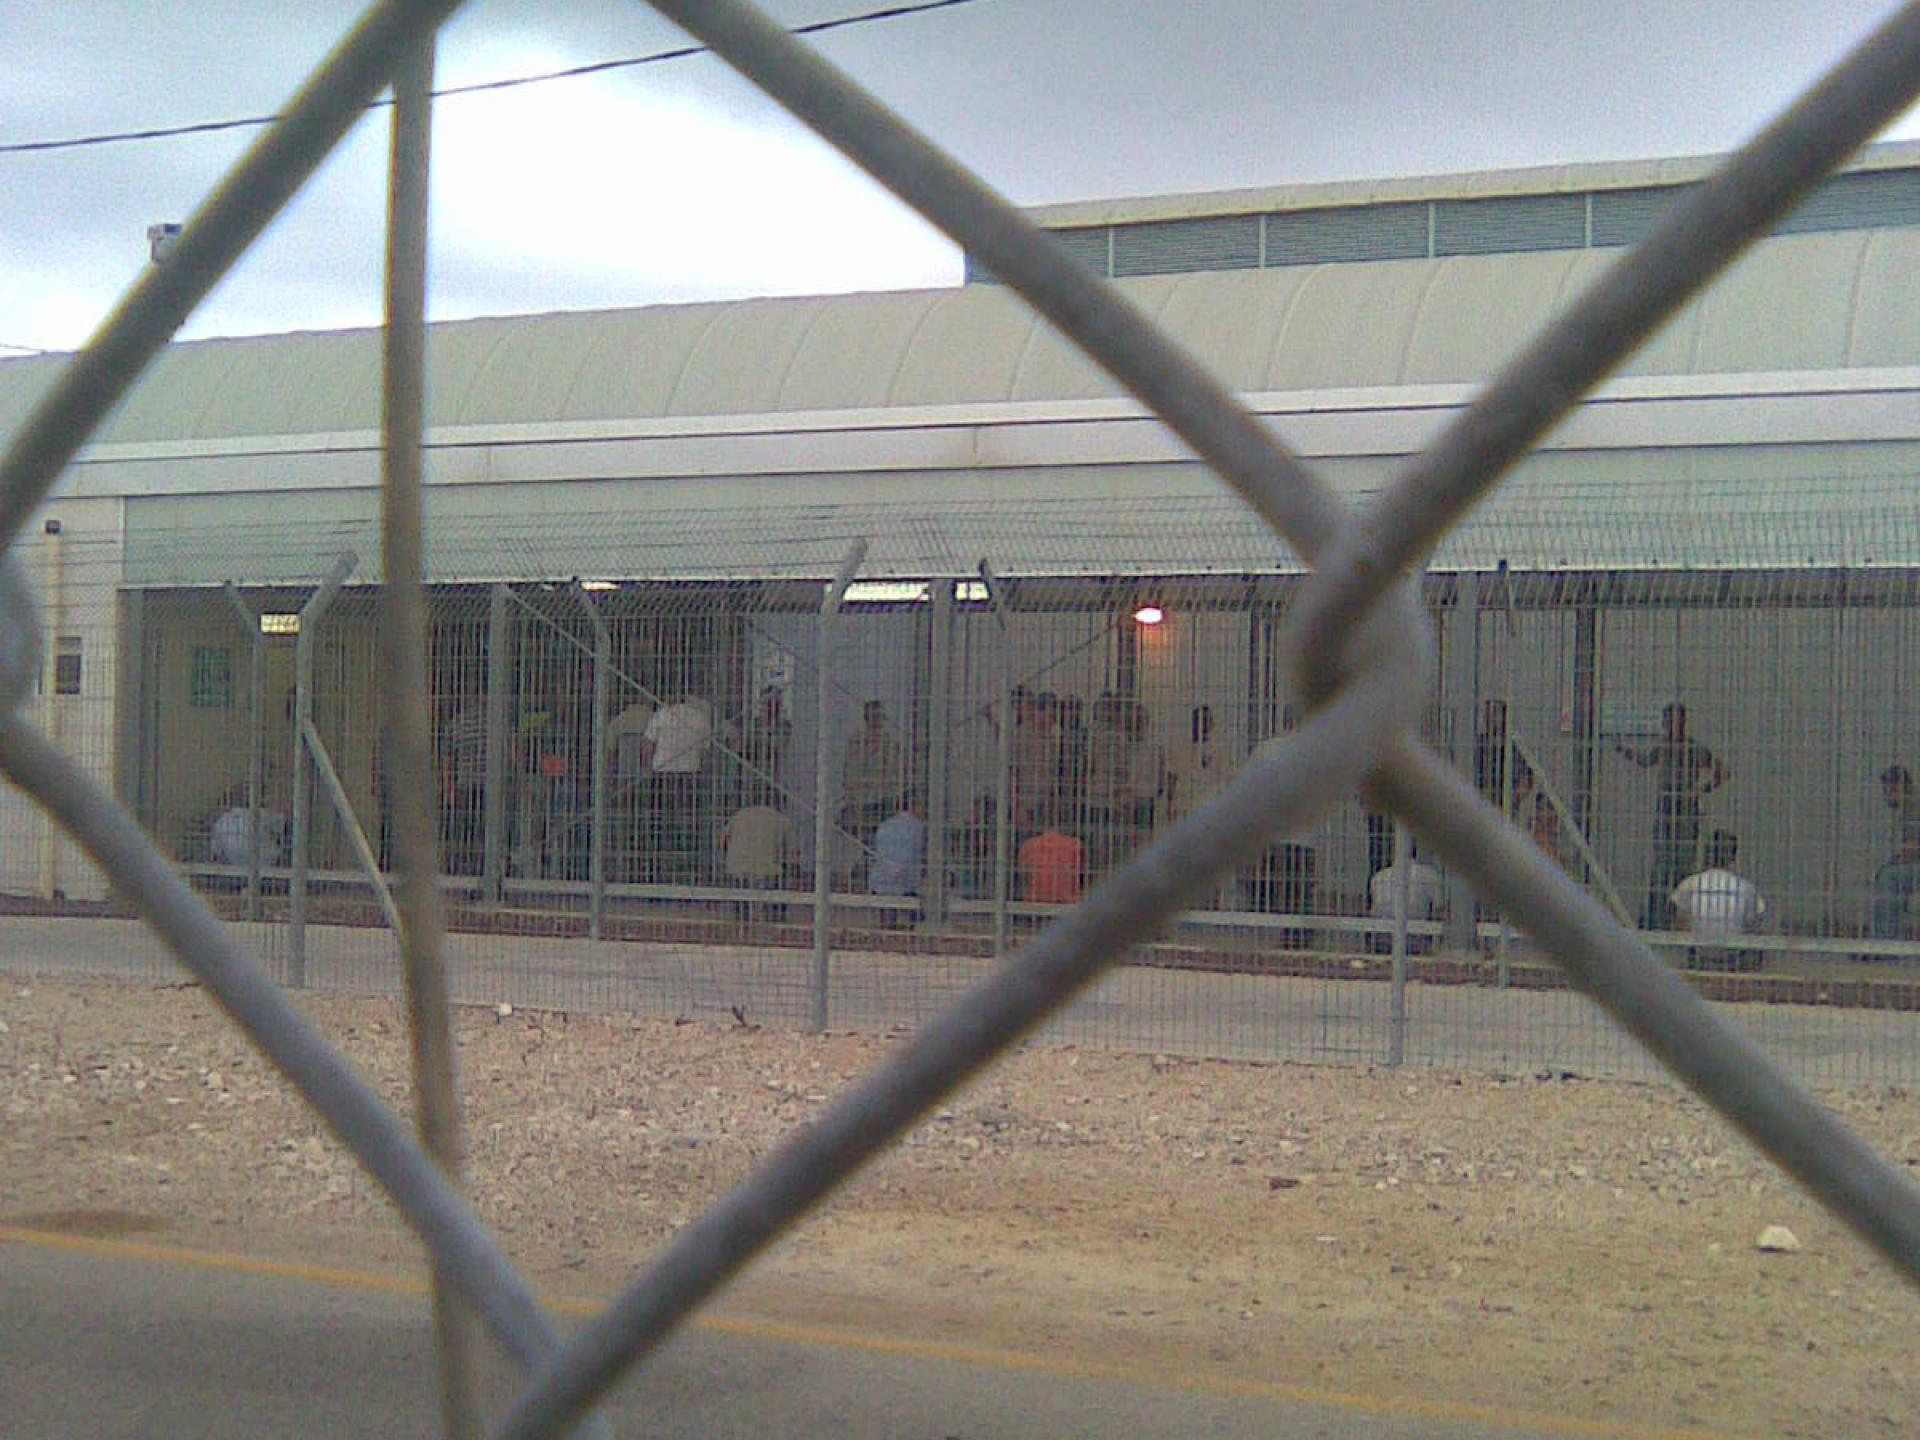 Barta'a/Reikhan checkpoint 27.07.08